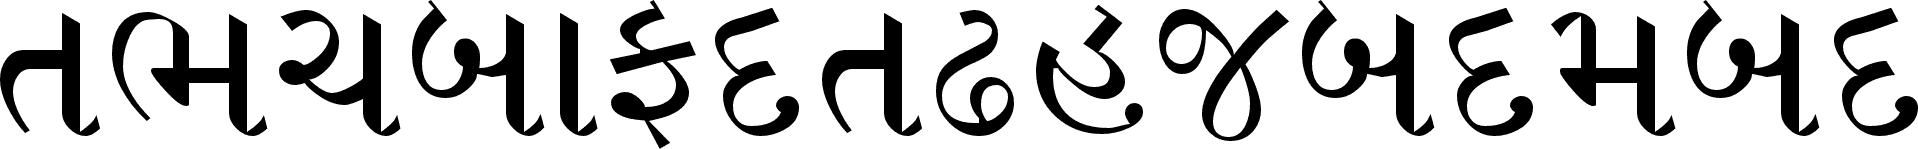 Akash gujarati font download.